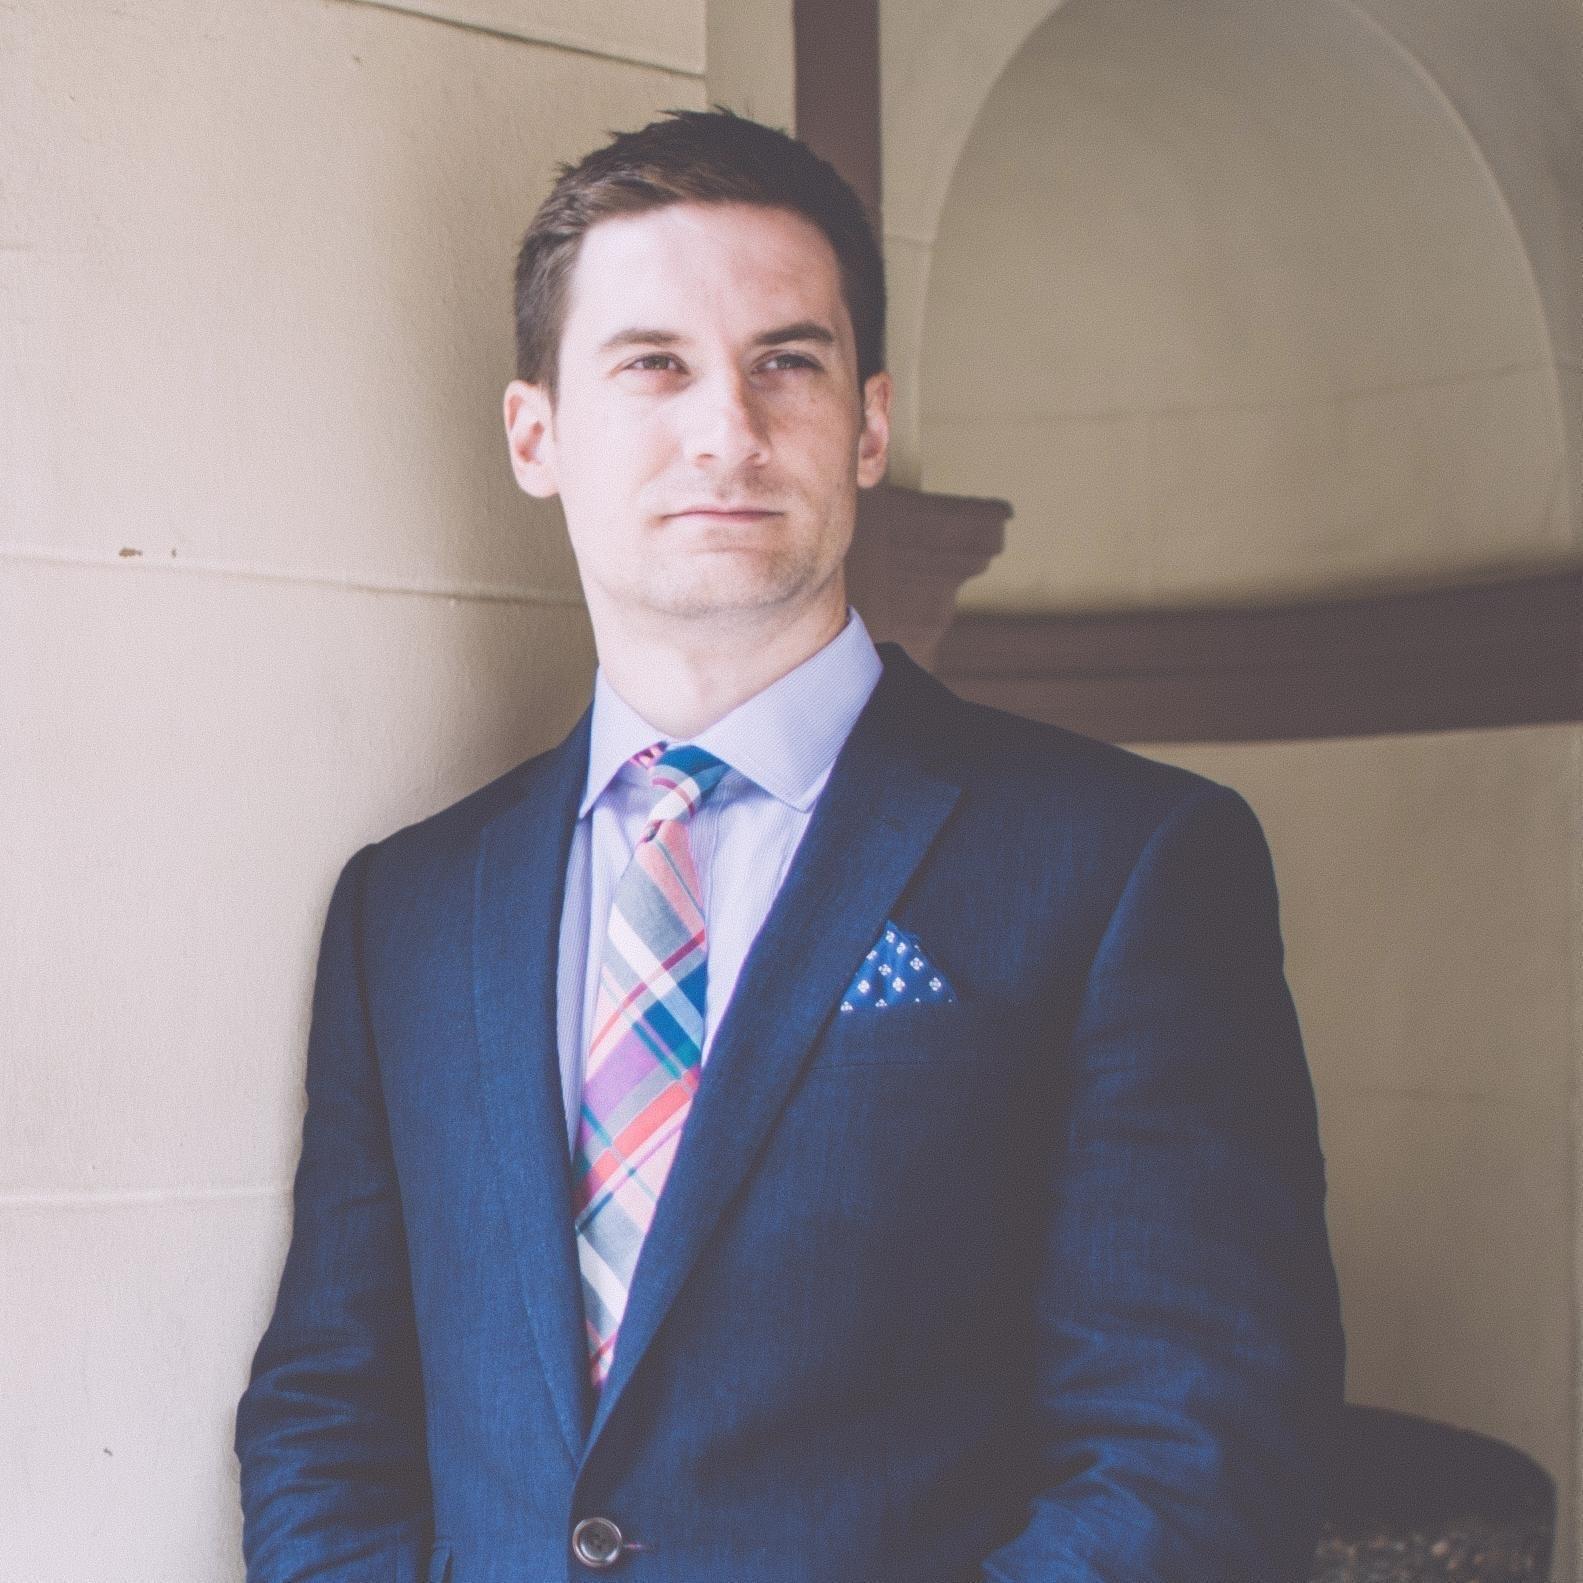 Chris Eigner